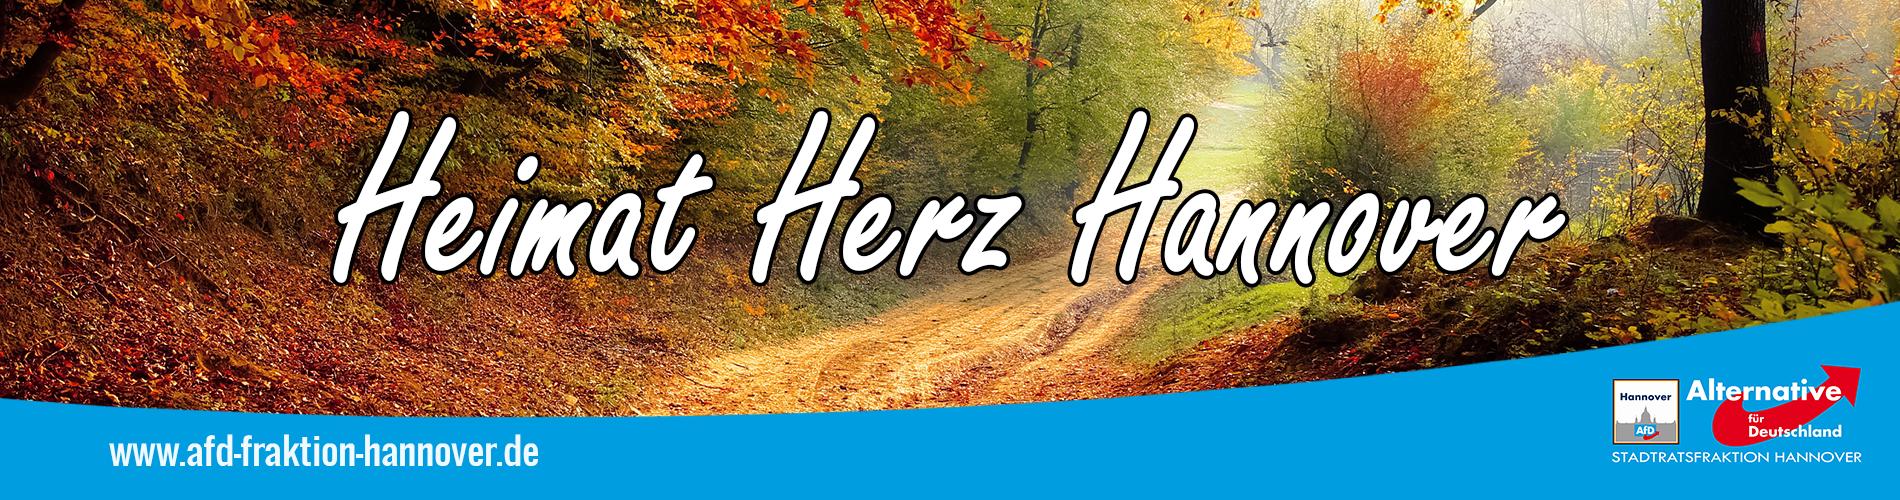 Header-Hompage-Herbst